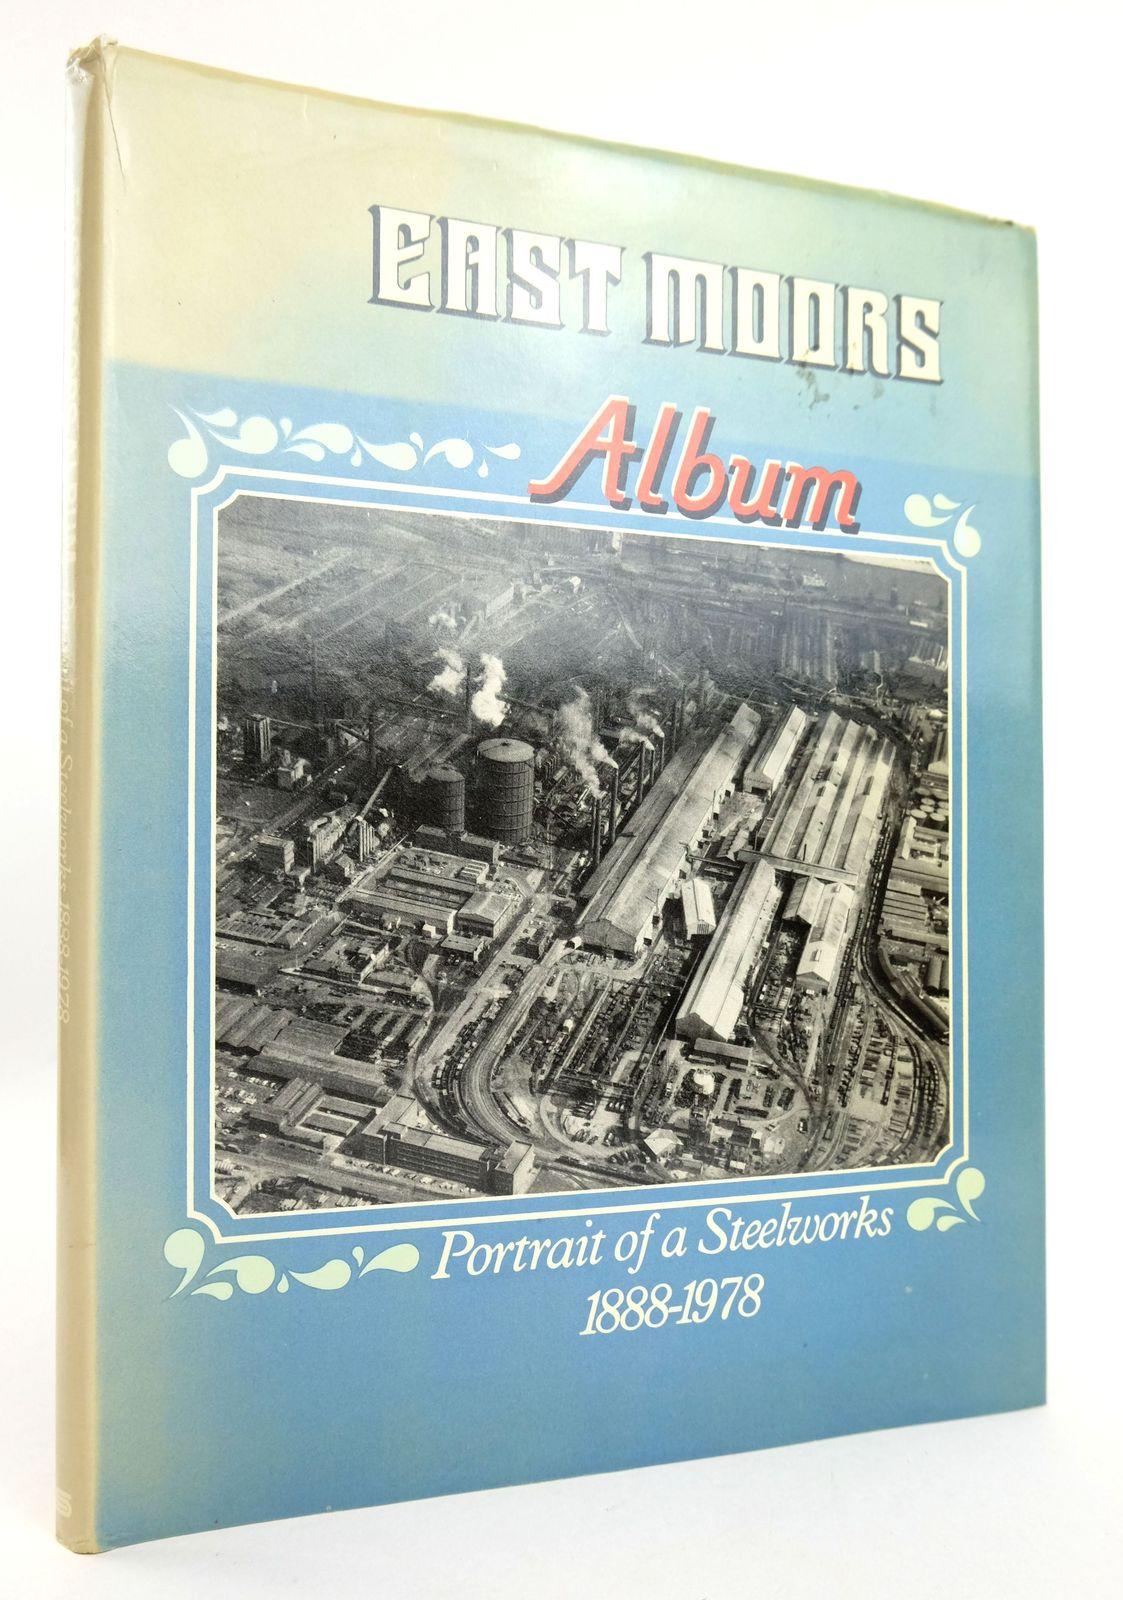 Photo of EAST MOORS ALBUM PORTRAIT OF A STEEL WORKS 1888-1978